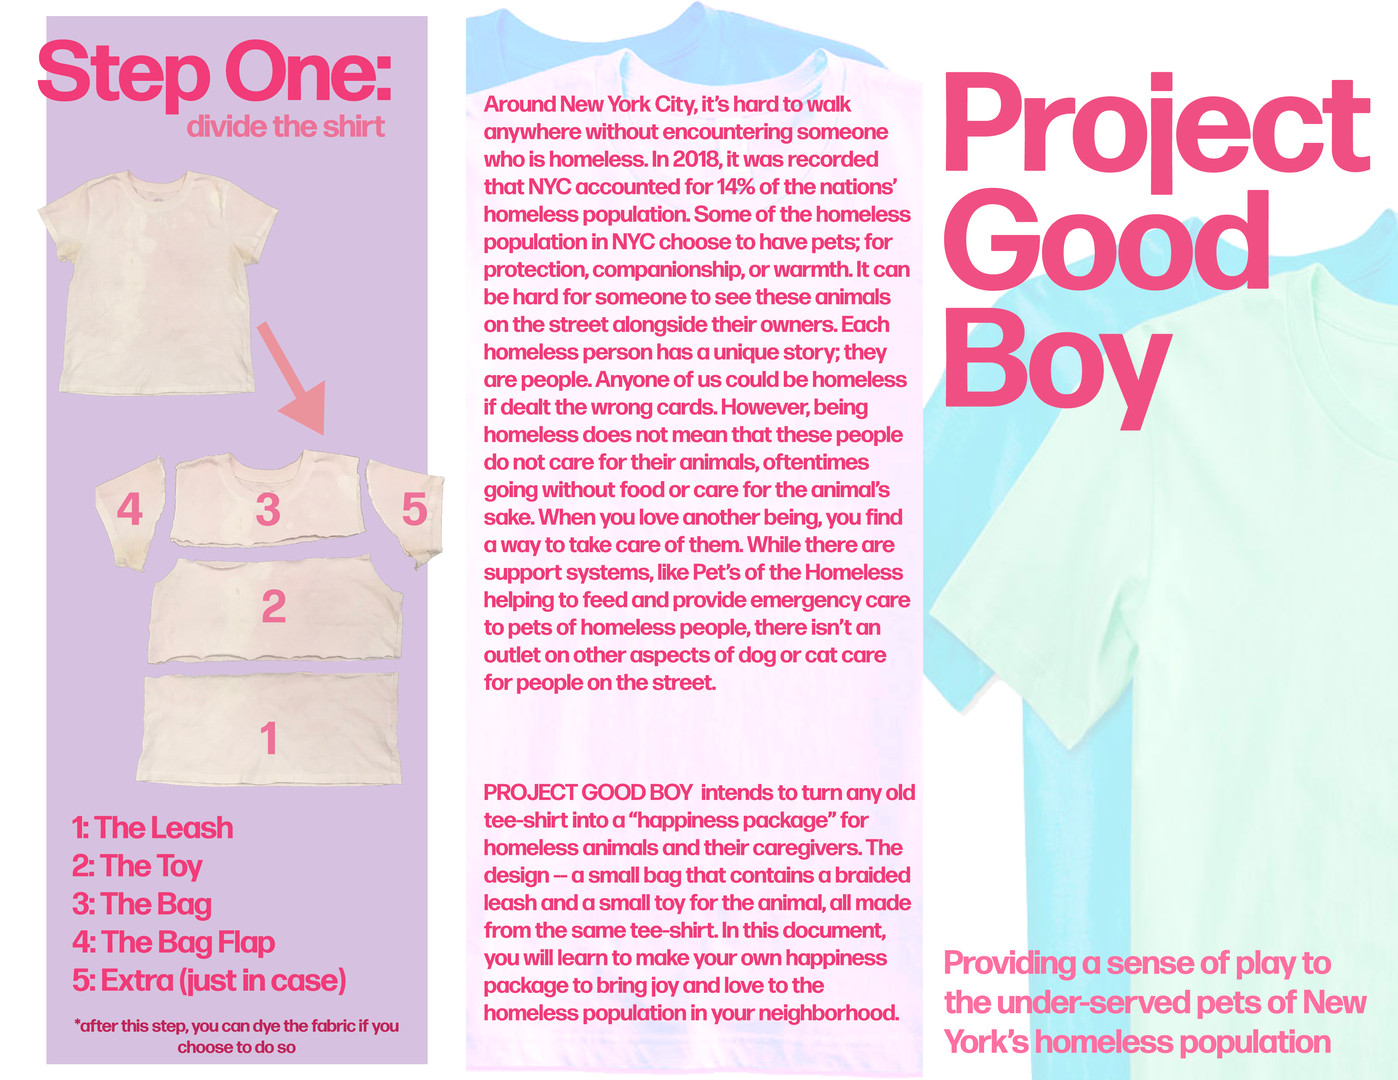 Project Good Boy pamphlet